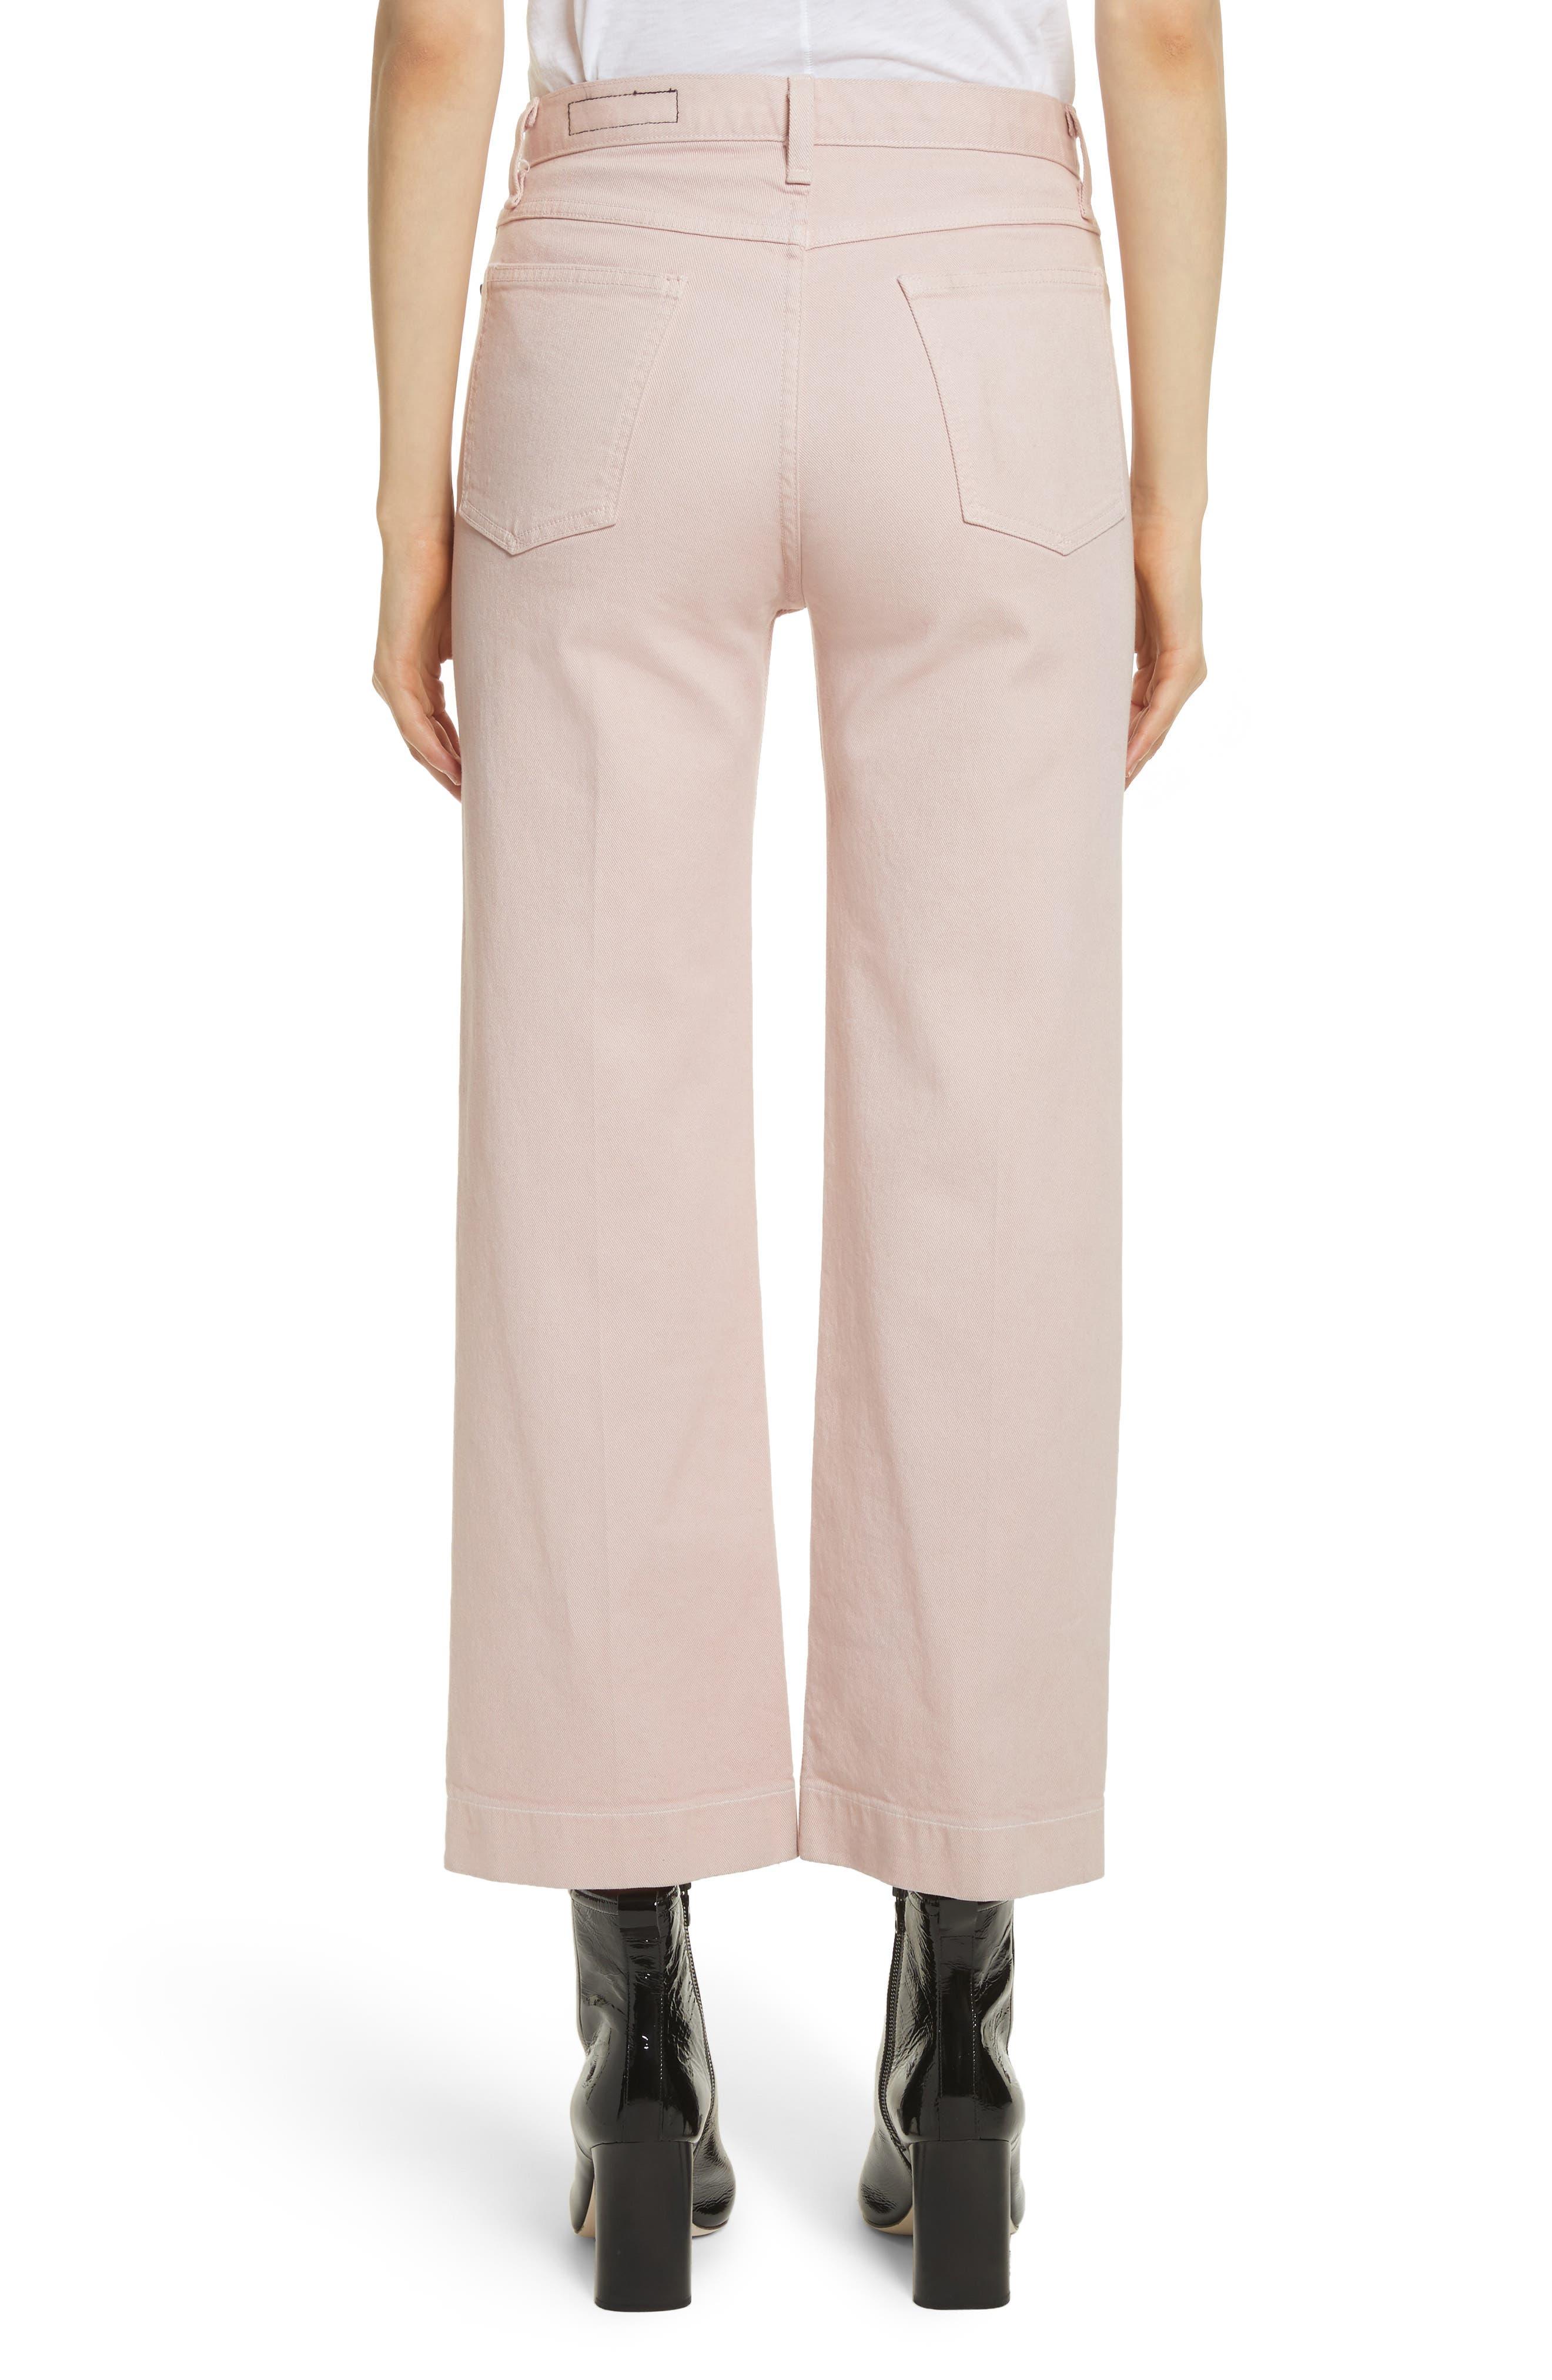 Justine High Waist Trouser Jeans,                             Alternate thumbnail 2, color,